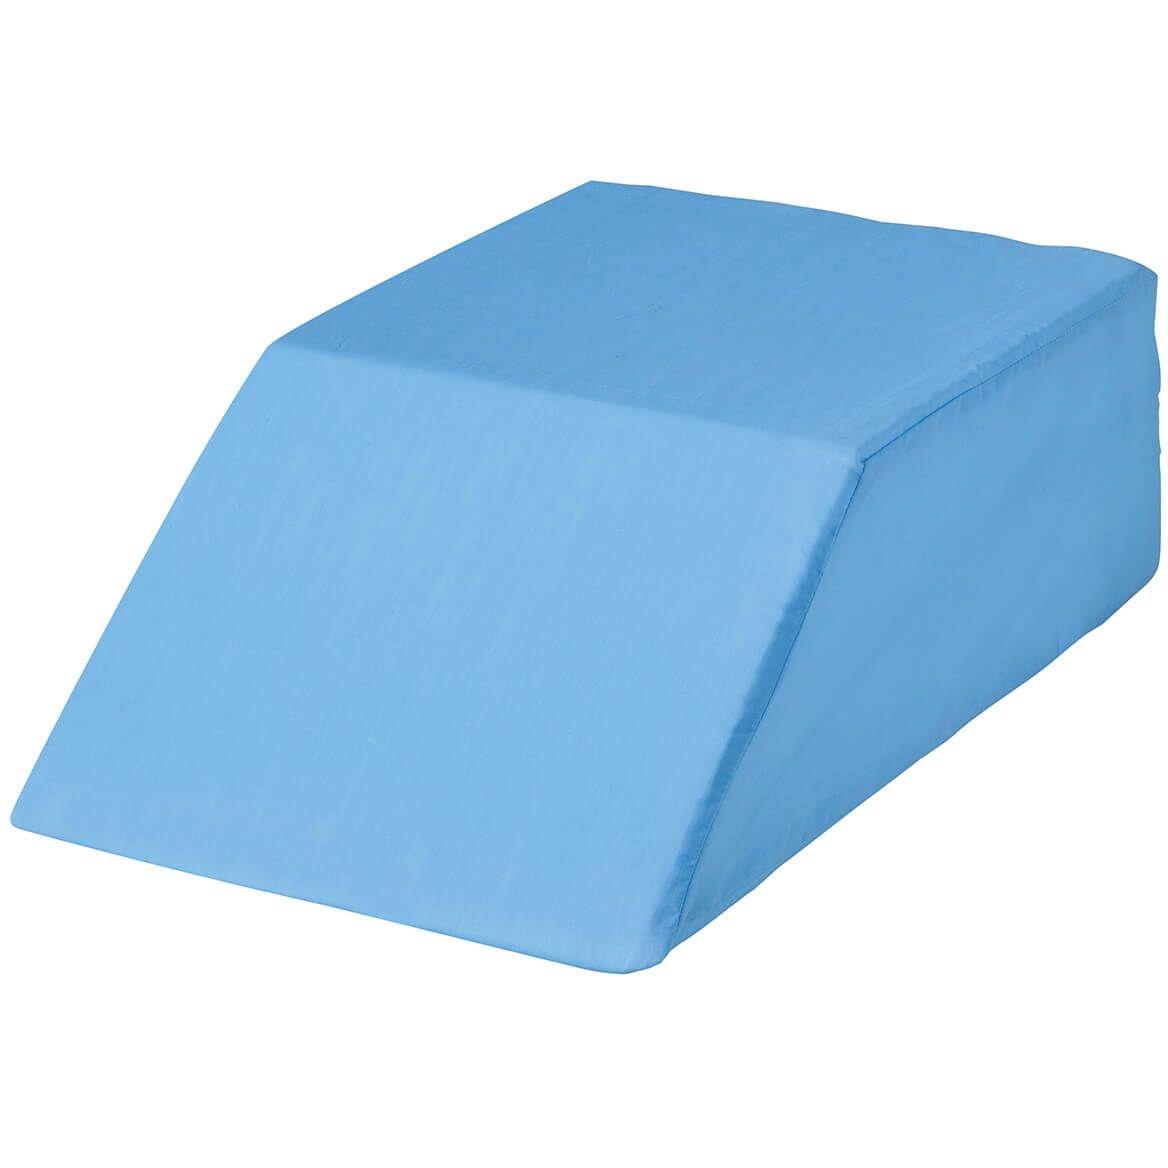 Elevated Leg Lift Pillow-347745